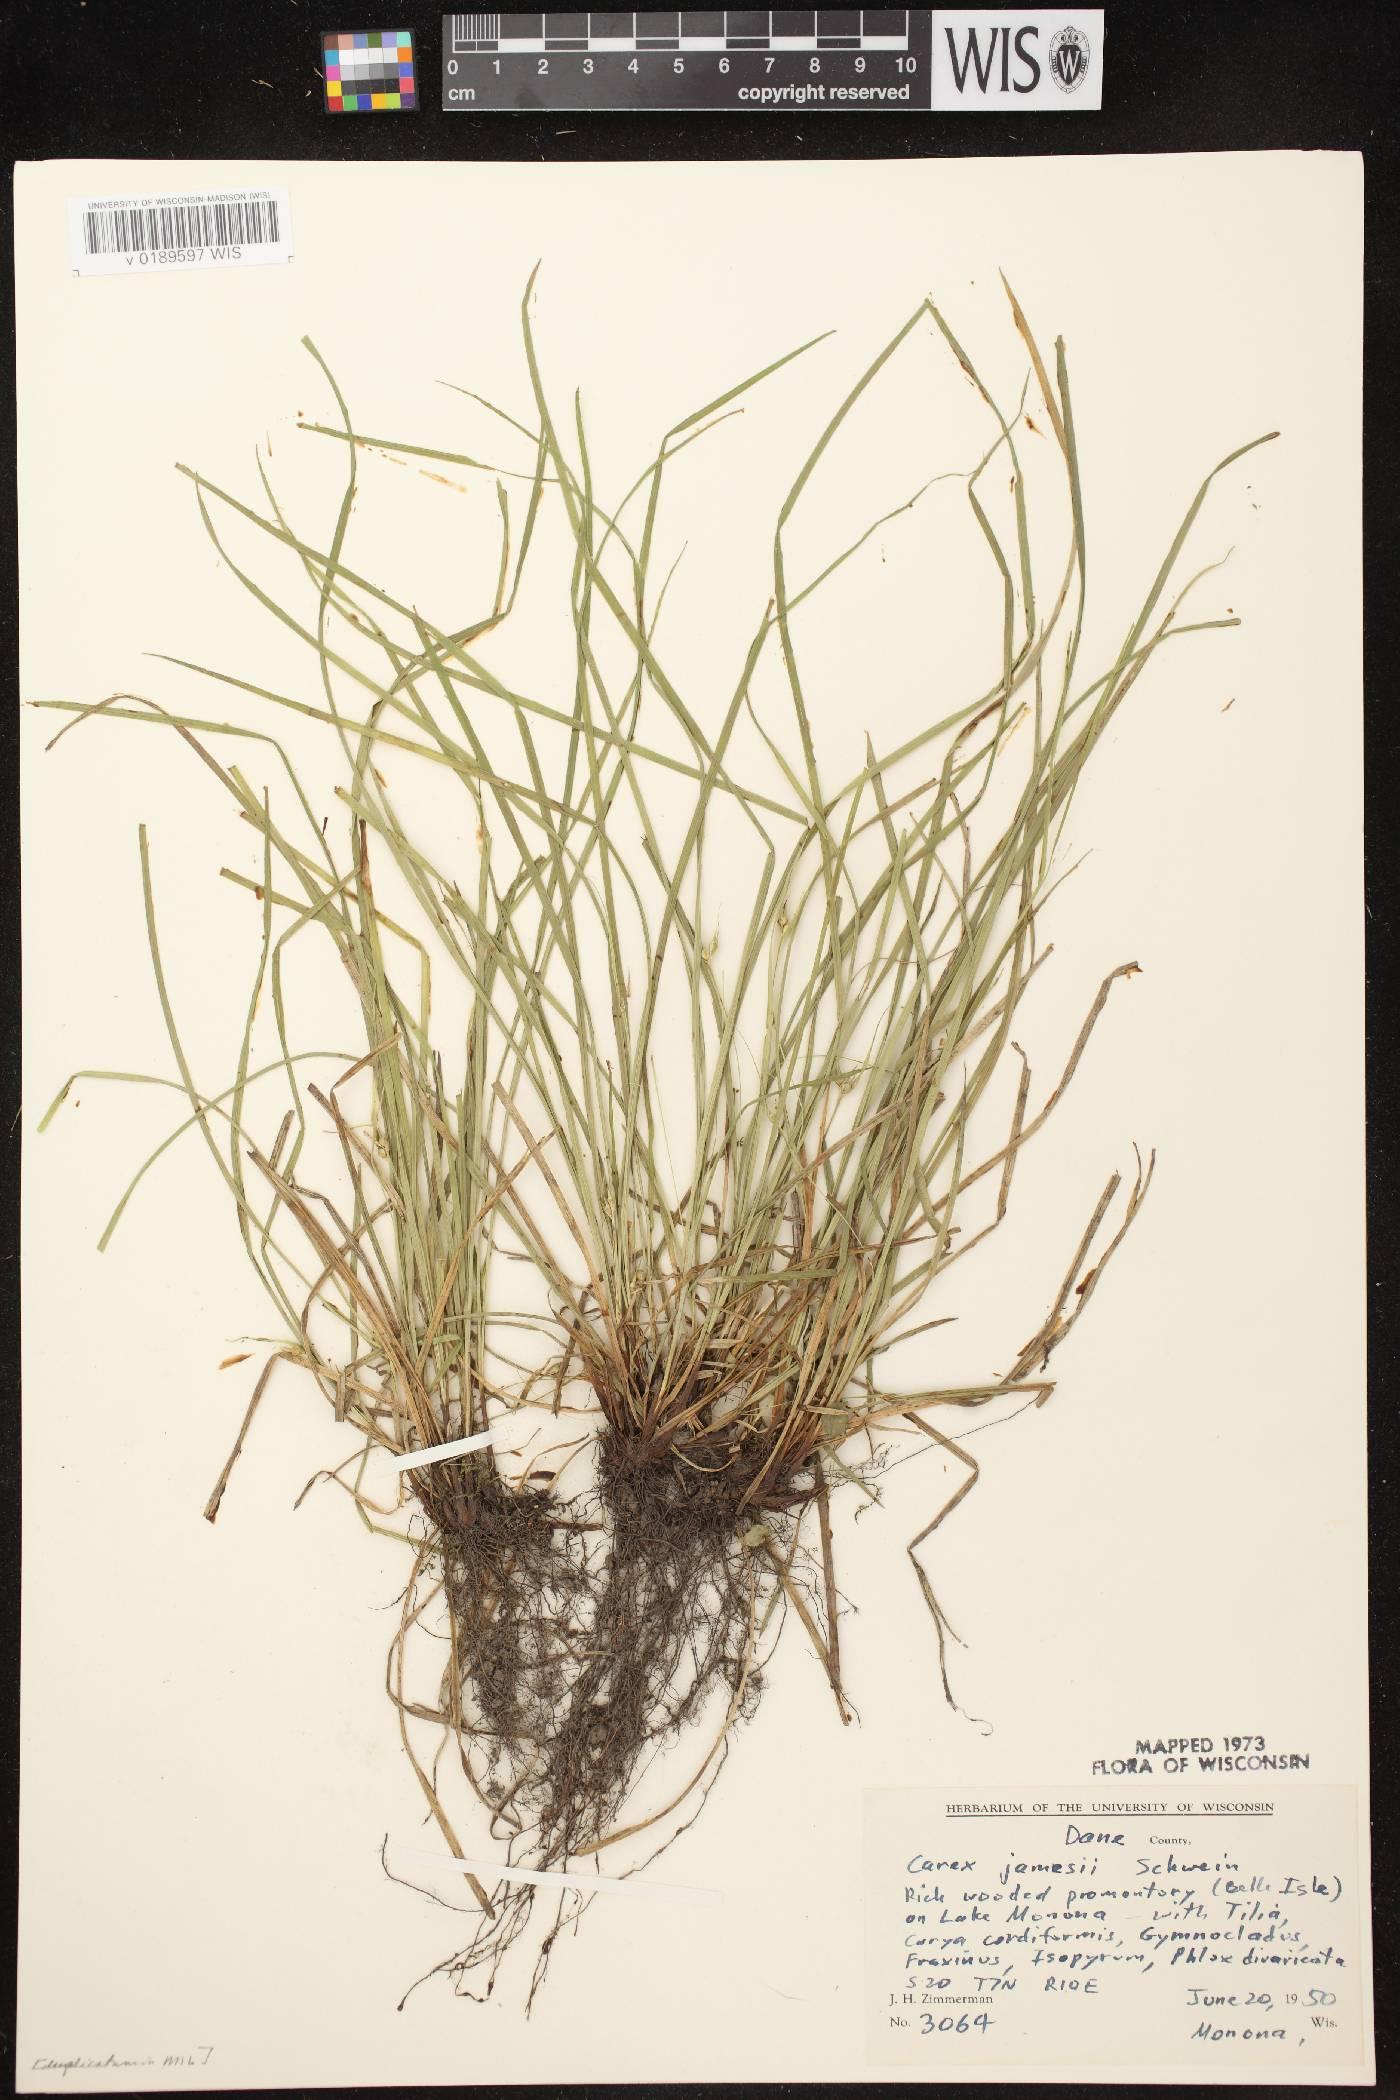 Carex jamesii image